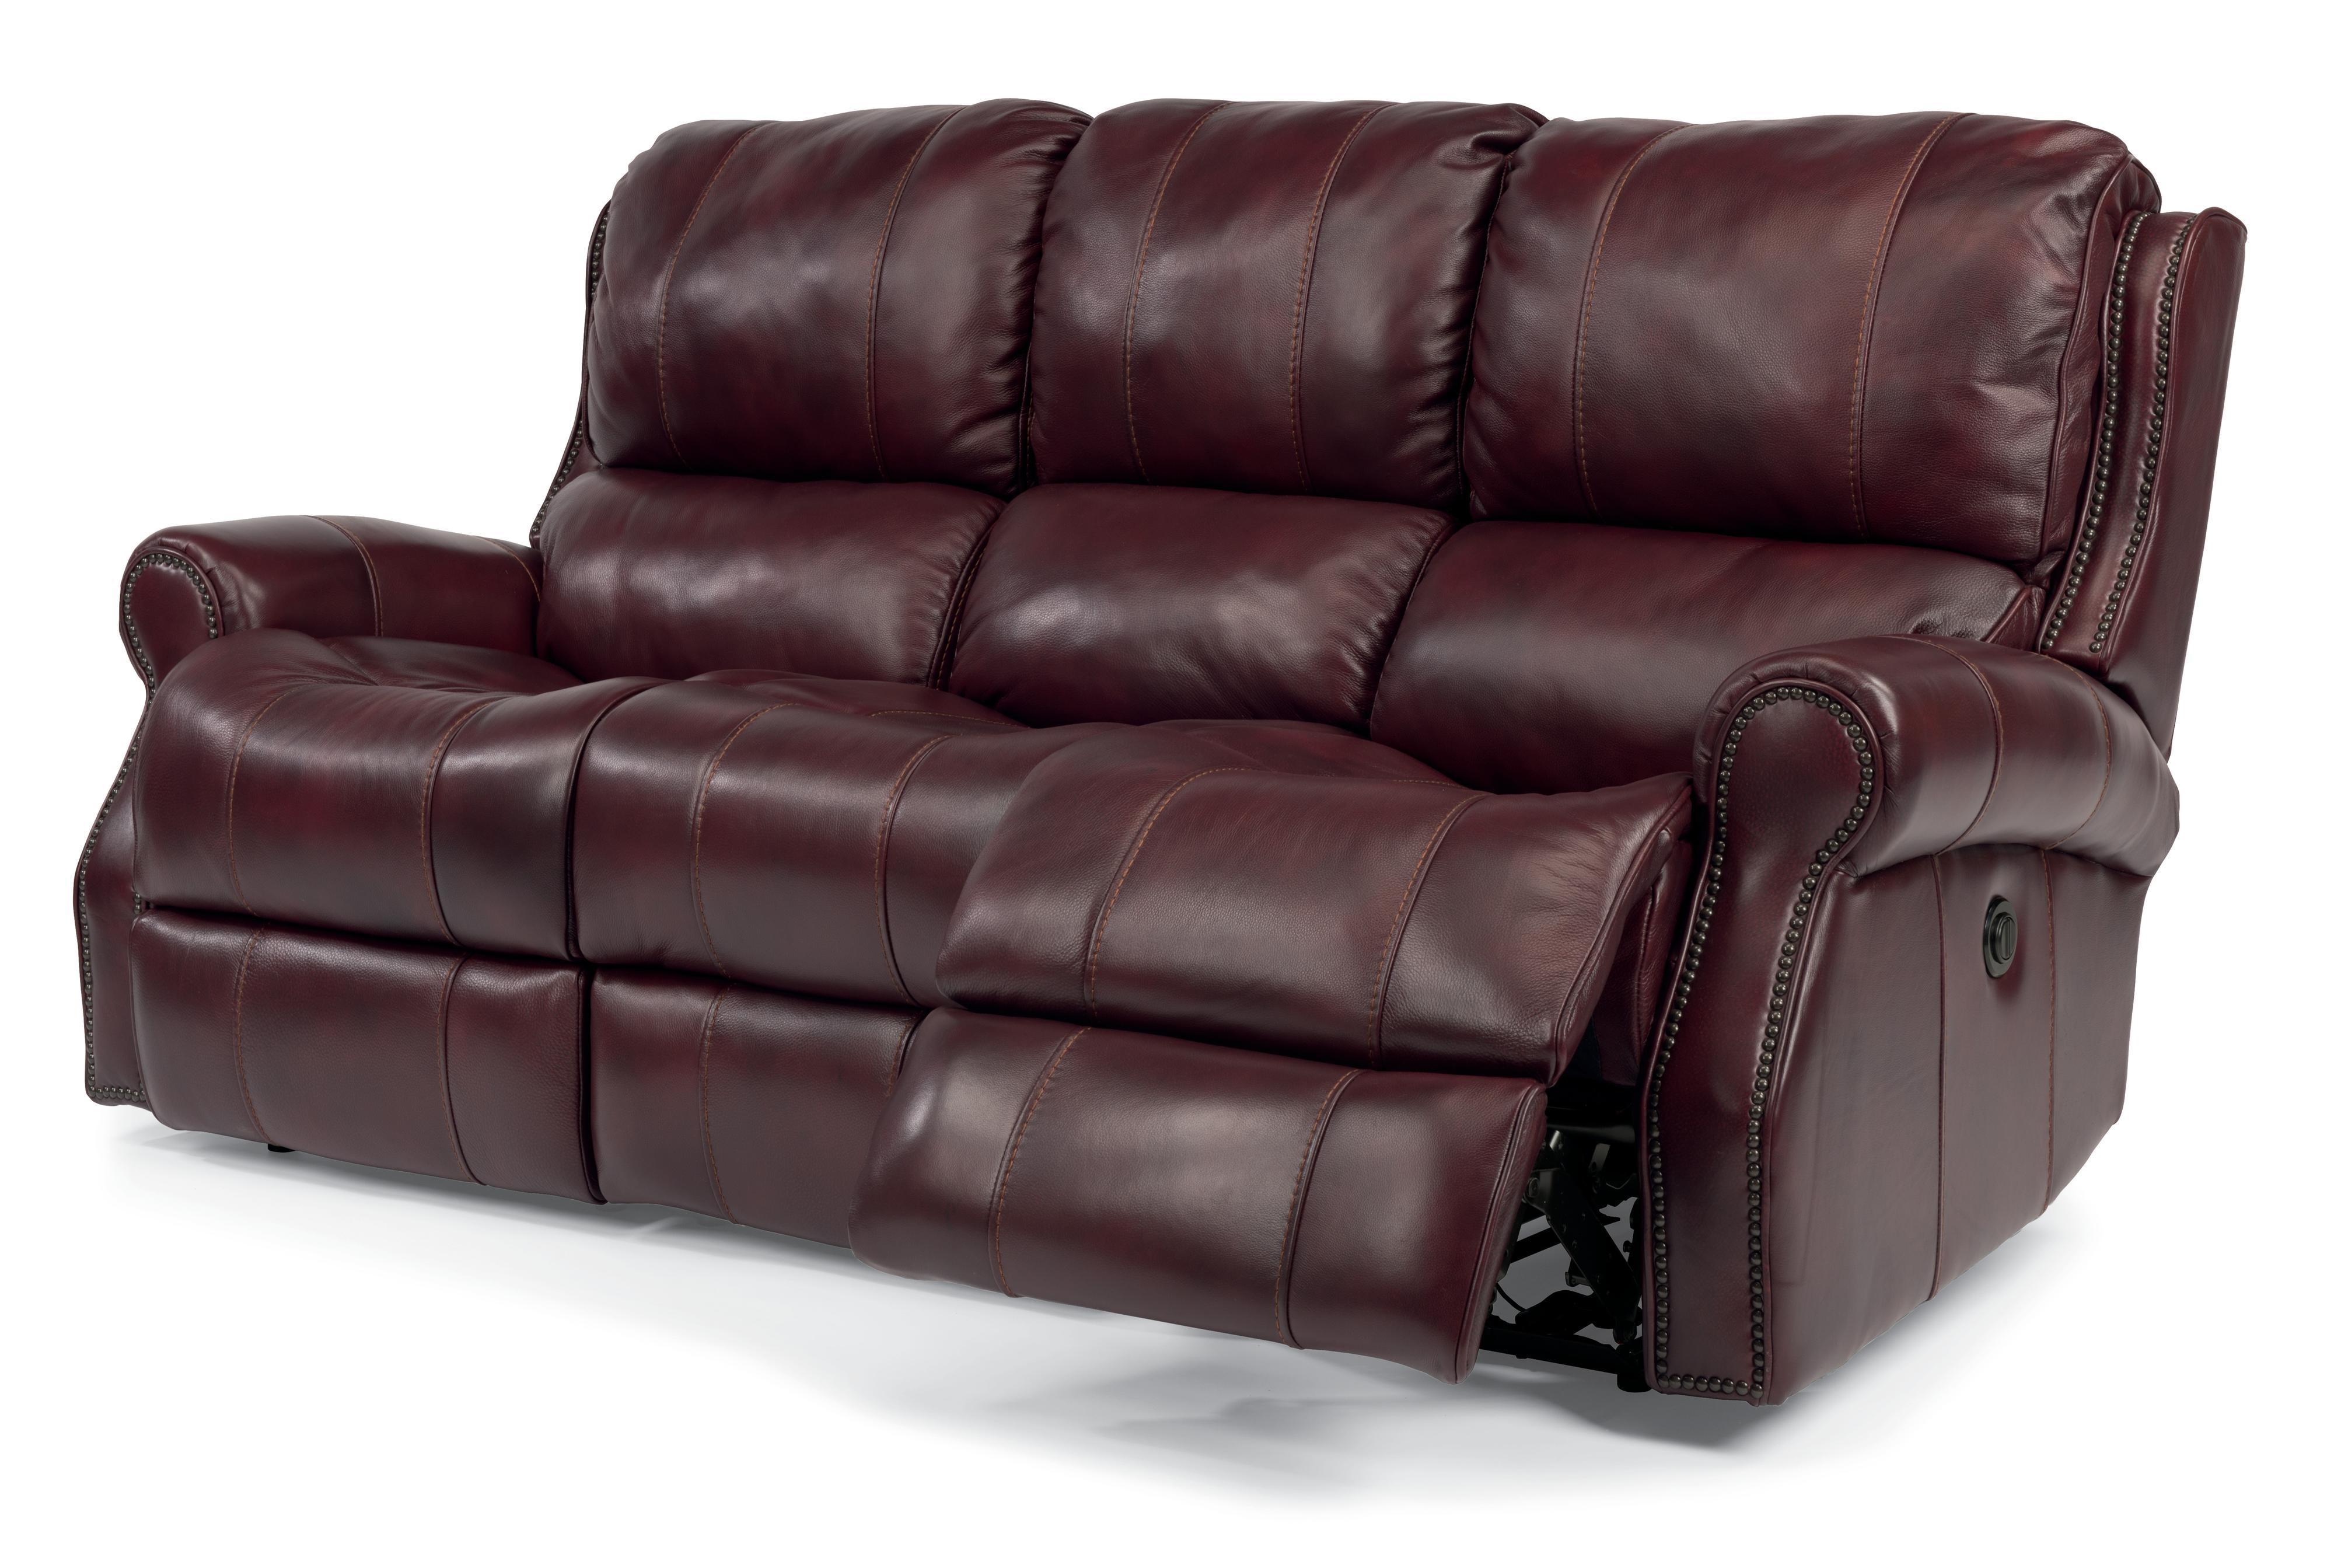 Well Known Berkline Reclining Sofas 54 With Berkline Reclining Sofas For Berkline Sofas (Gallery 13 of 20)